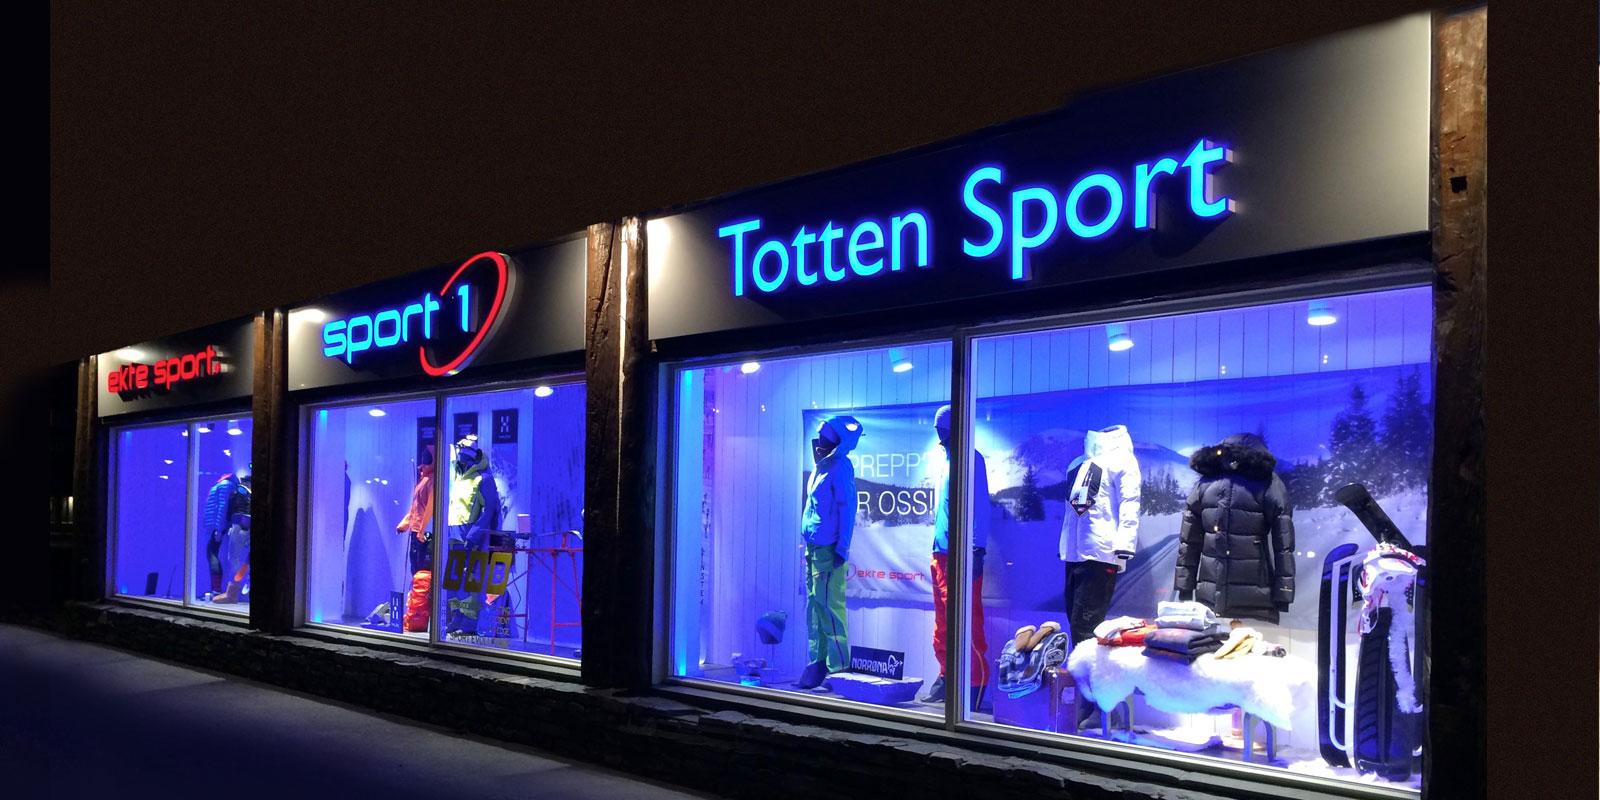 6bf938d2 Sport 1 Totten Sport